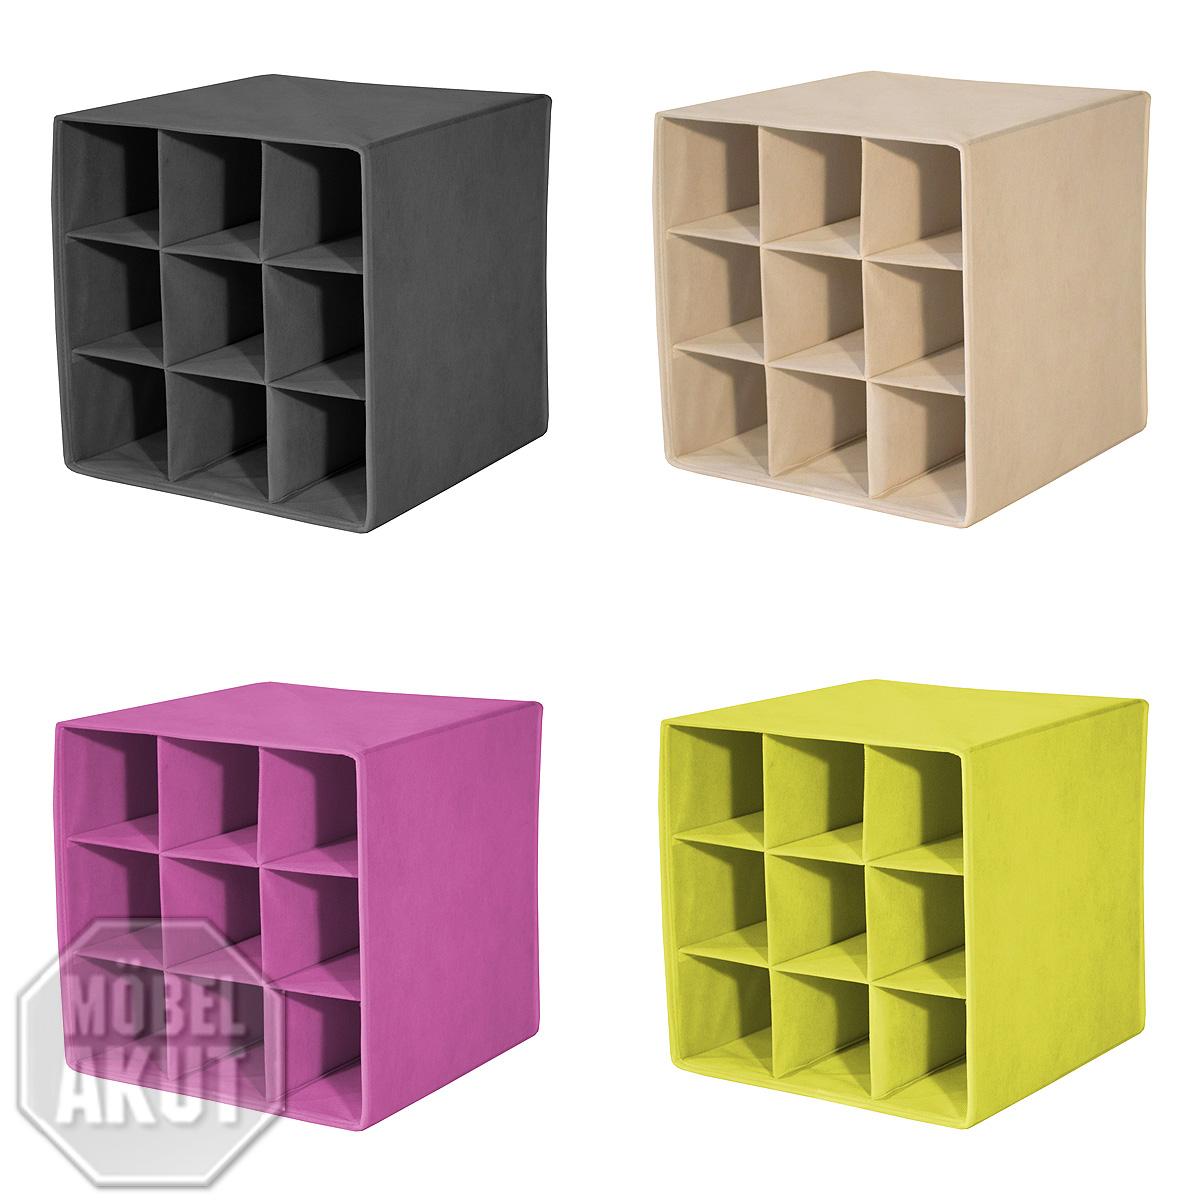 faltbox alfa 4 korb regal flaschenablage mit farbauswahl ebay. Black Bedroom Furniture Sets. Home Design Ideas